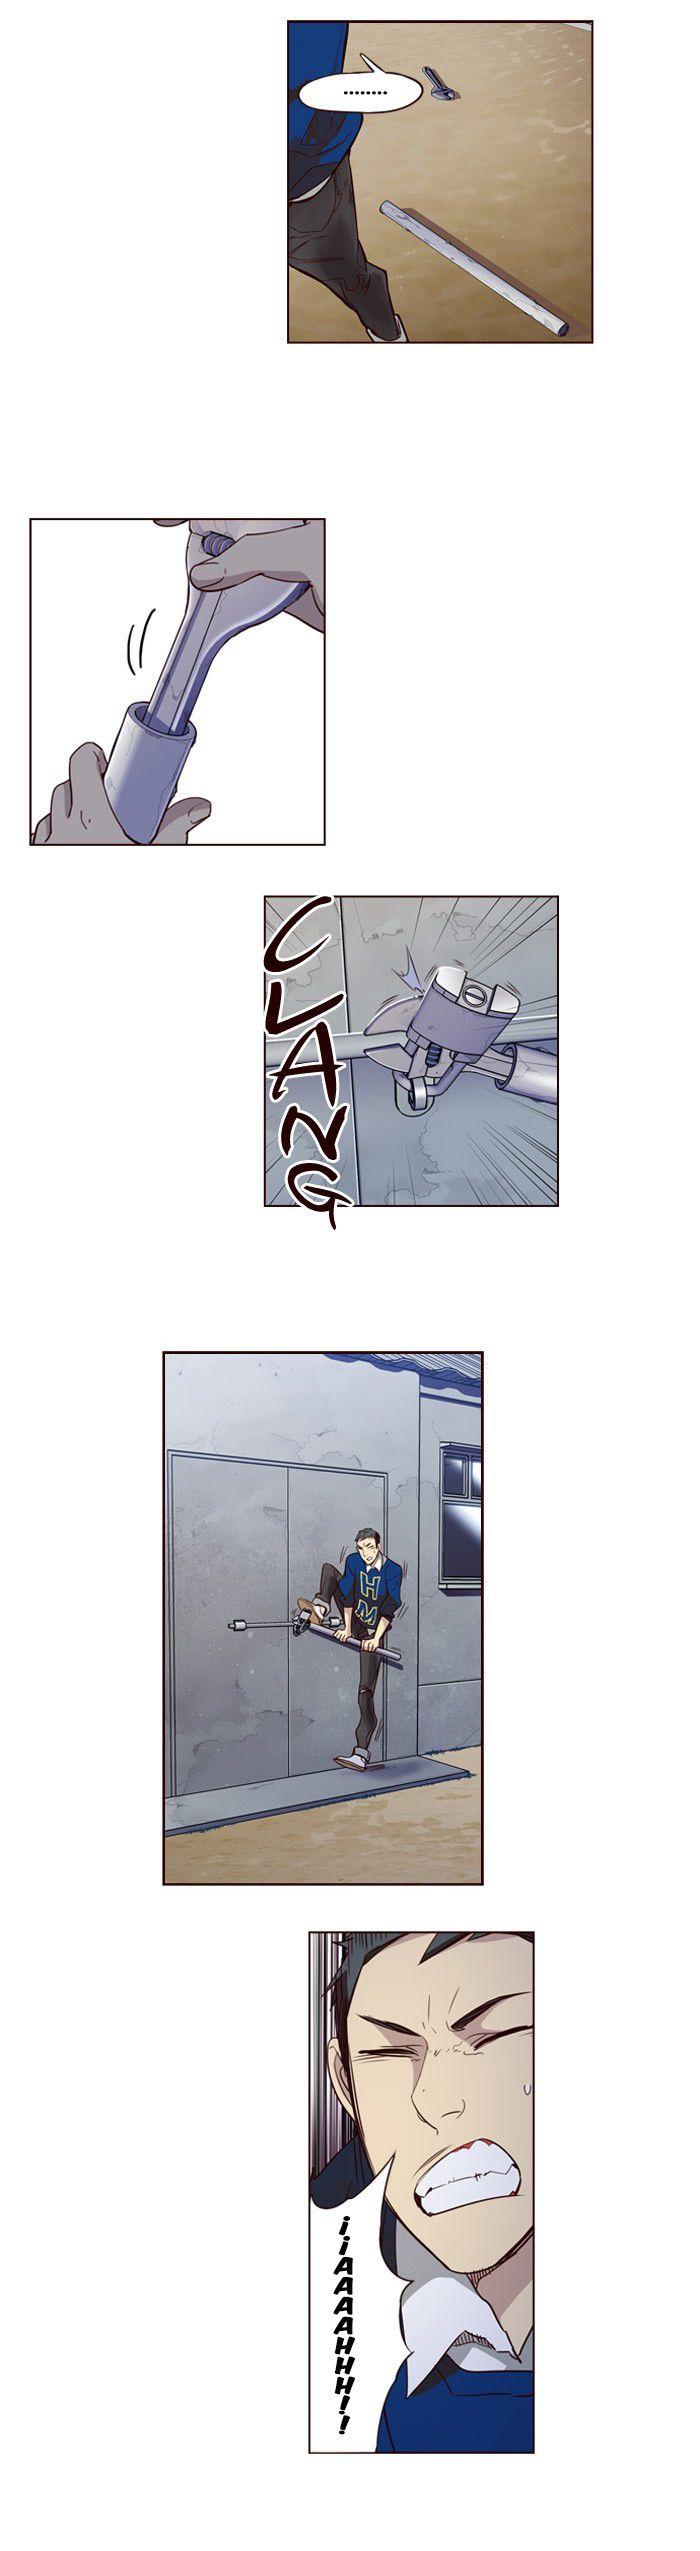 http://c5.ninemanga.com/es_manga/32/416/474803/55227490325309e34291c4cc92204a69.jpg Page 8